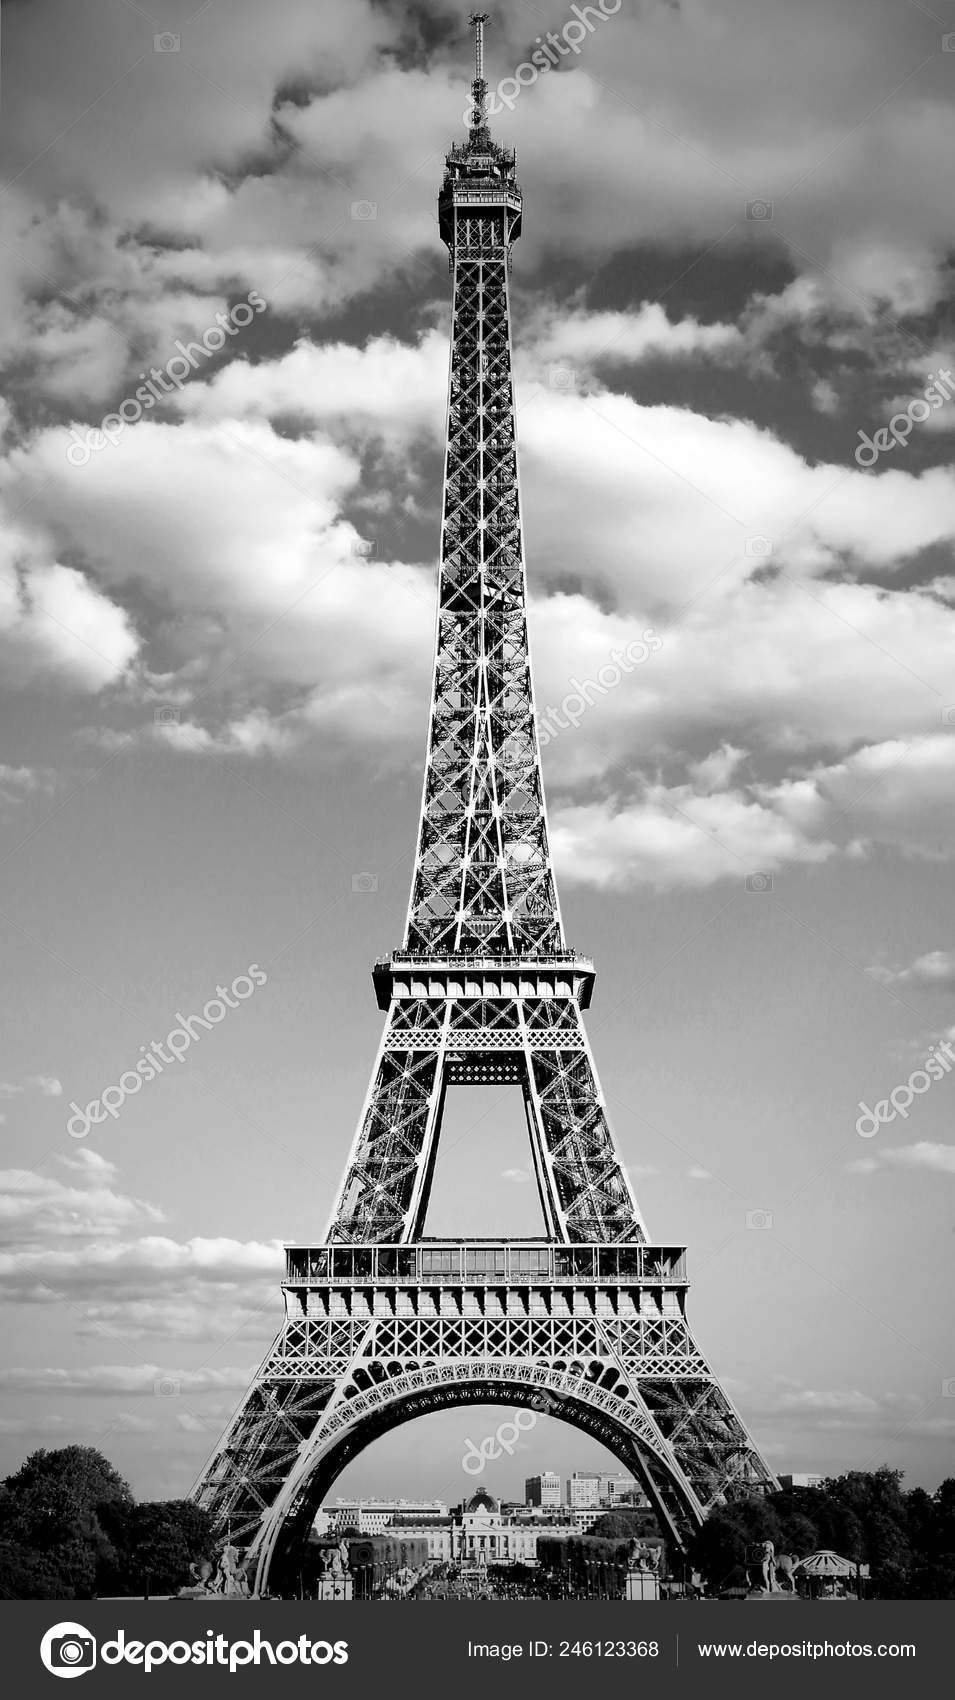 Eiffel Tower Symbol Paris France Black White Effect Trocadero Area Stock Photo C Chiccododifc 246123368